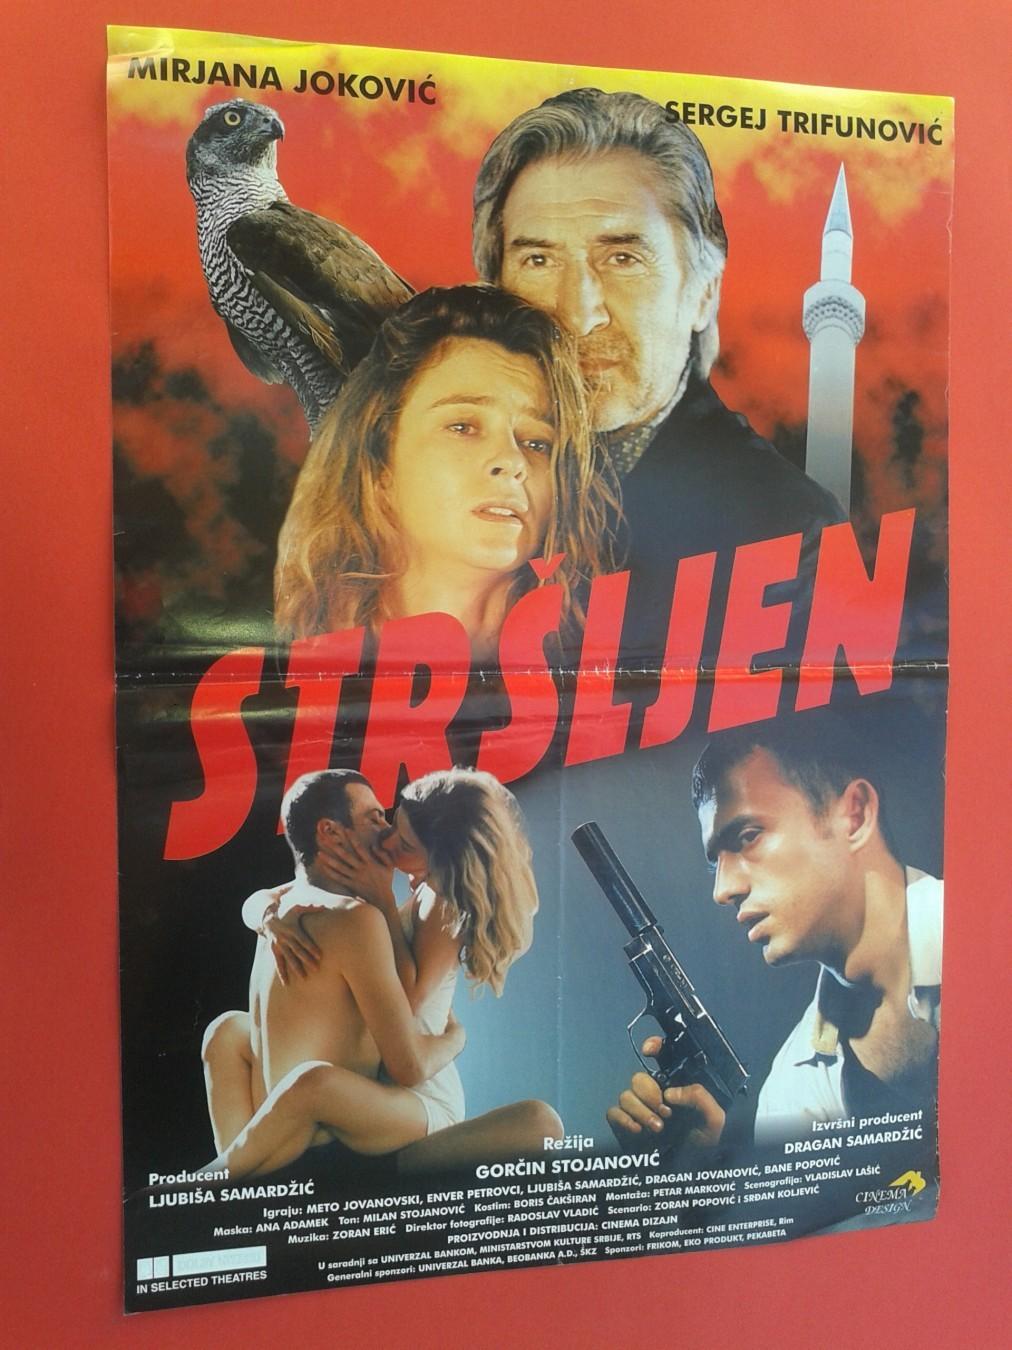 Filmski plakati - Page 17 STRSLjEN-Domaci-film-Filmski-plakat_slika_O_38629145